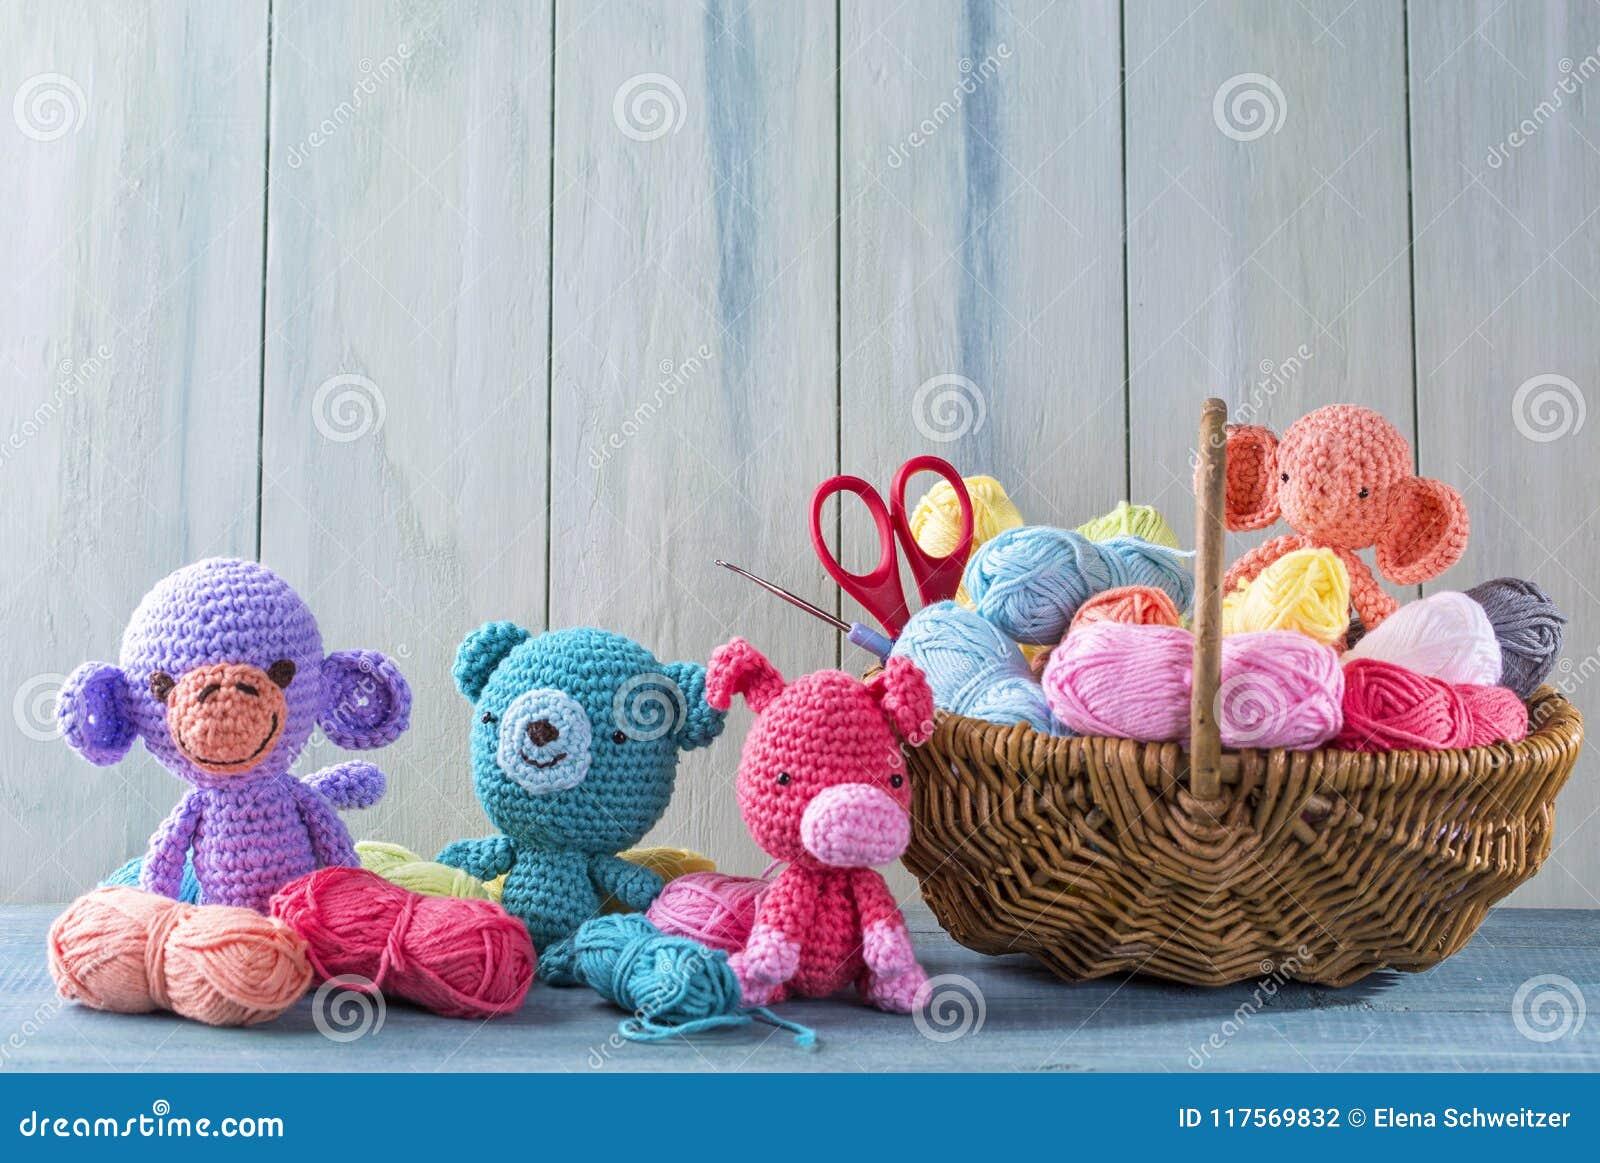 Wholesales Baby Crochet Amigurumi Stuffed Toys 100% Handmade Eco ... | 962x1300